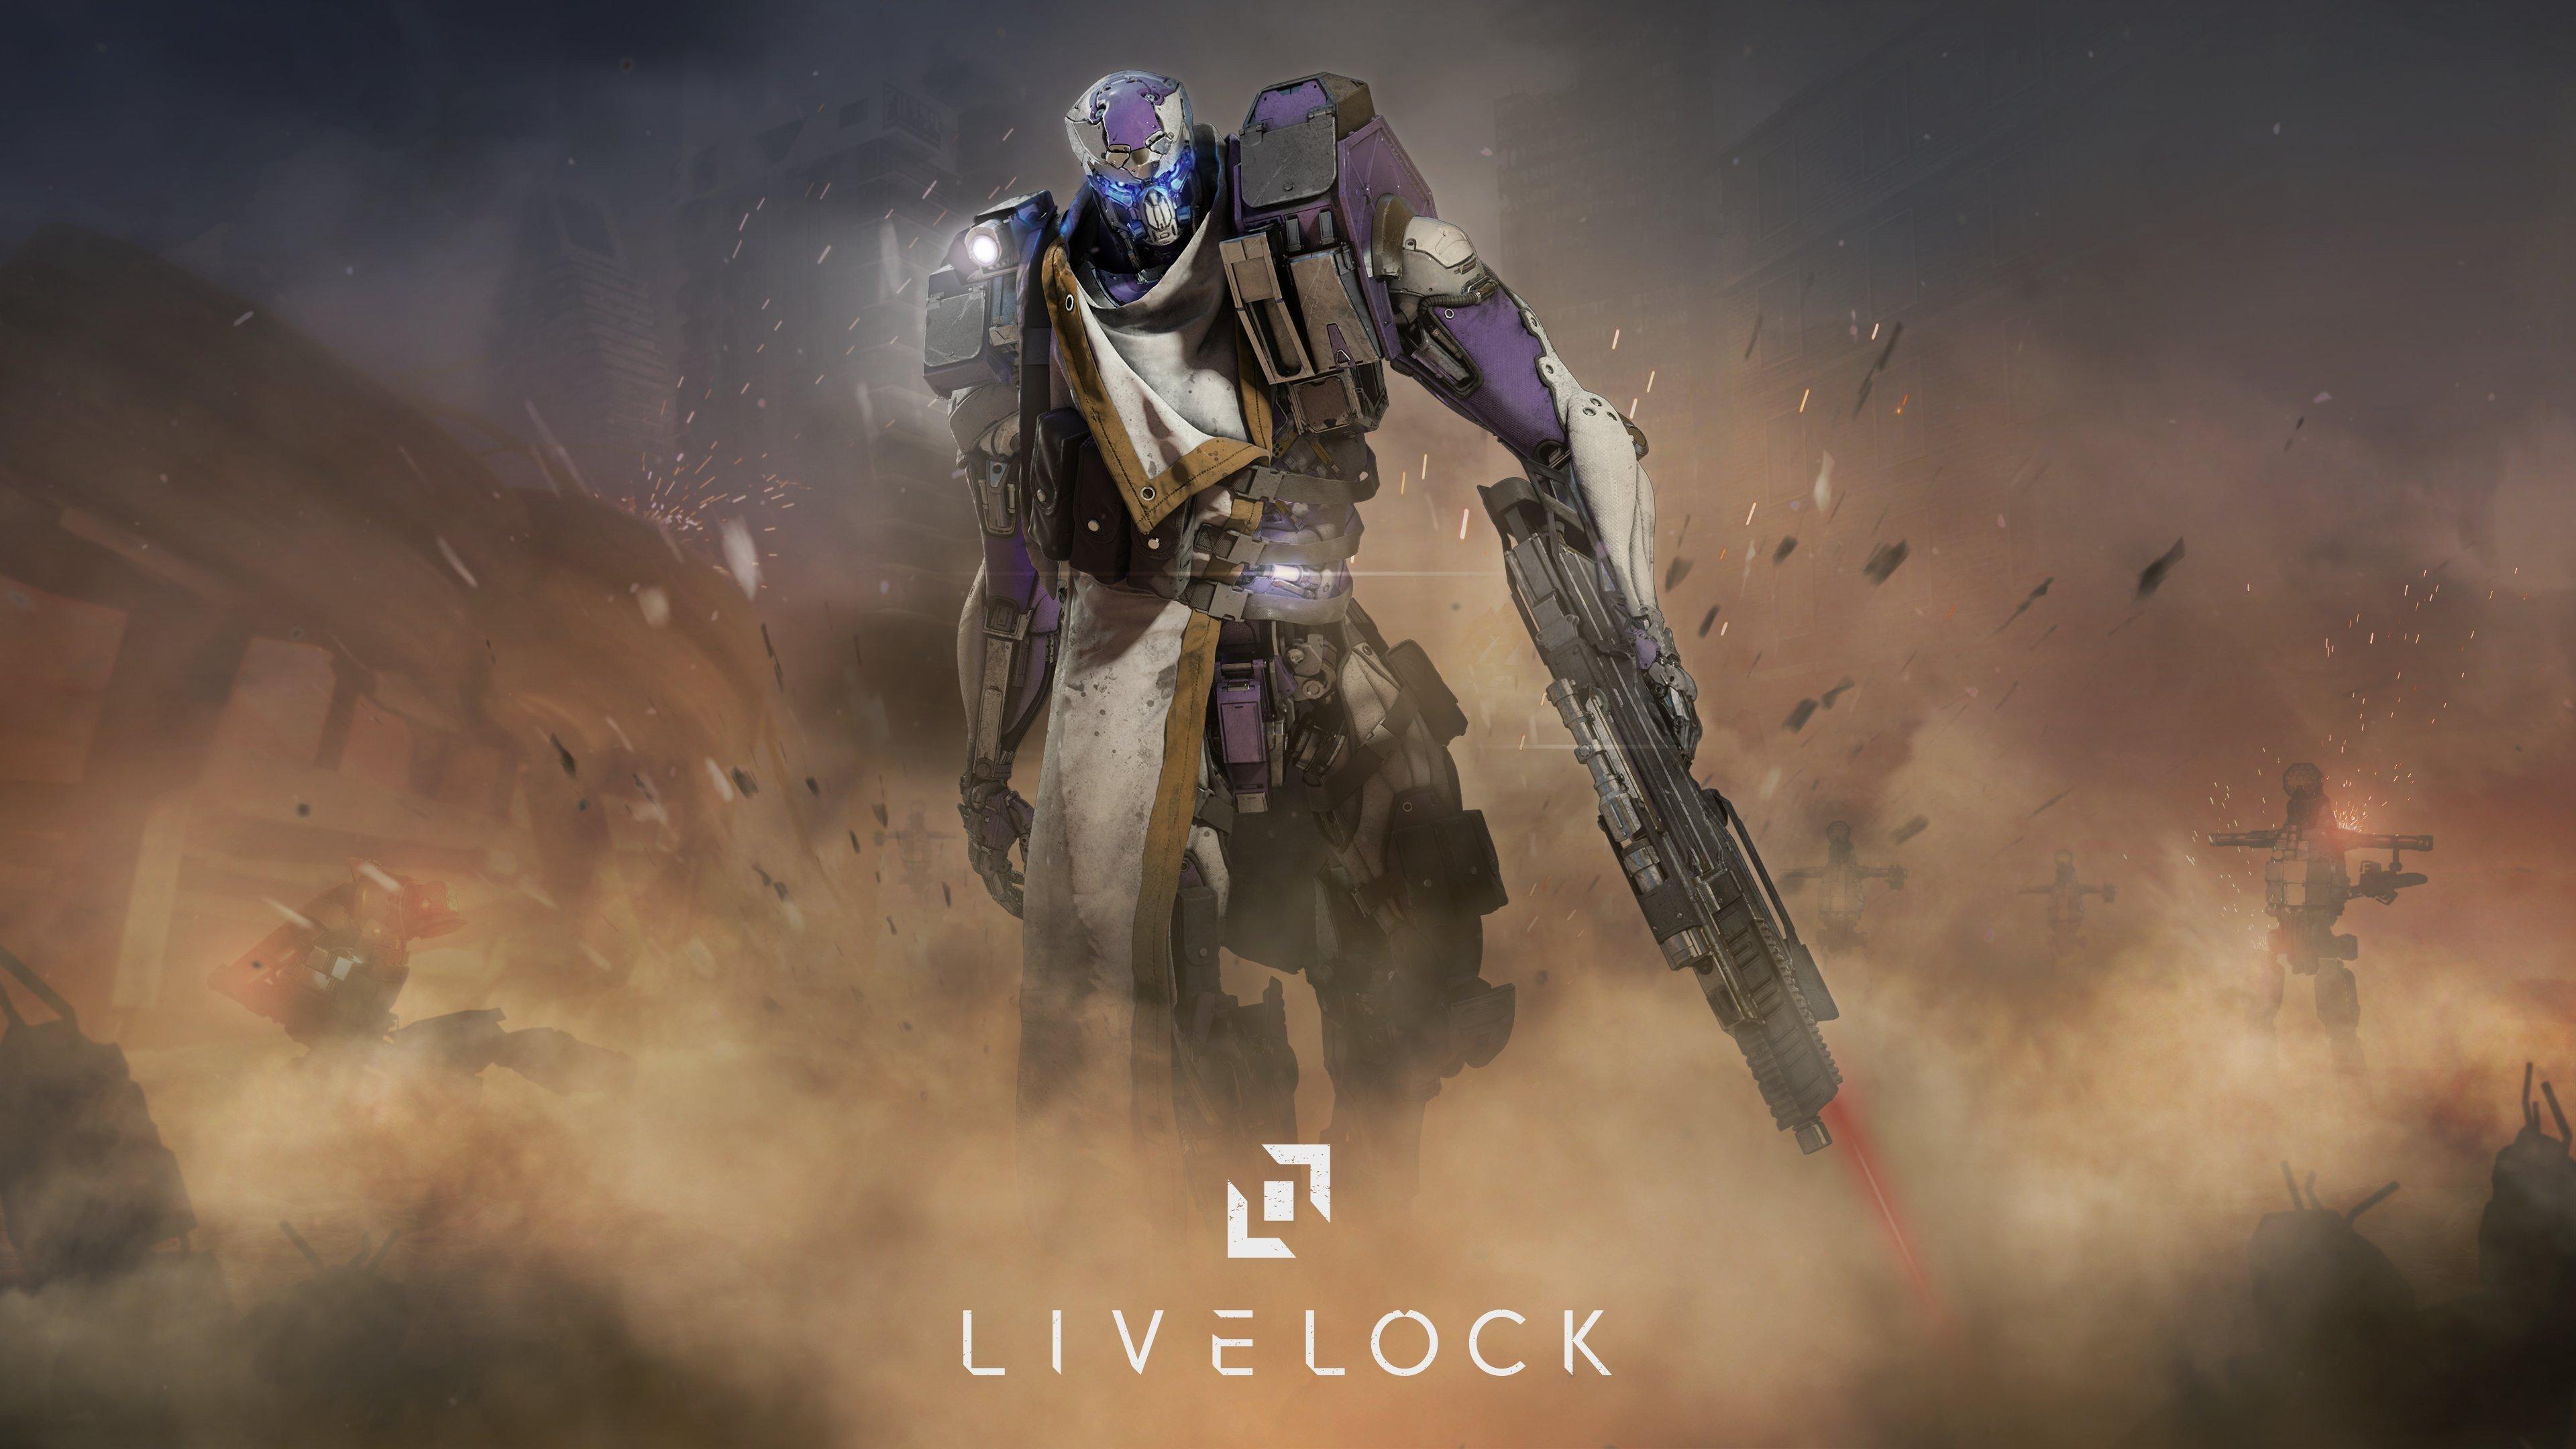 livelock ps4 game 1535967635 - Livelock Ps4 Game - ps games wallpapers, livelock wallpapers, games wallpapers